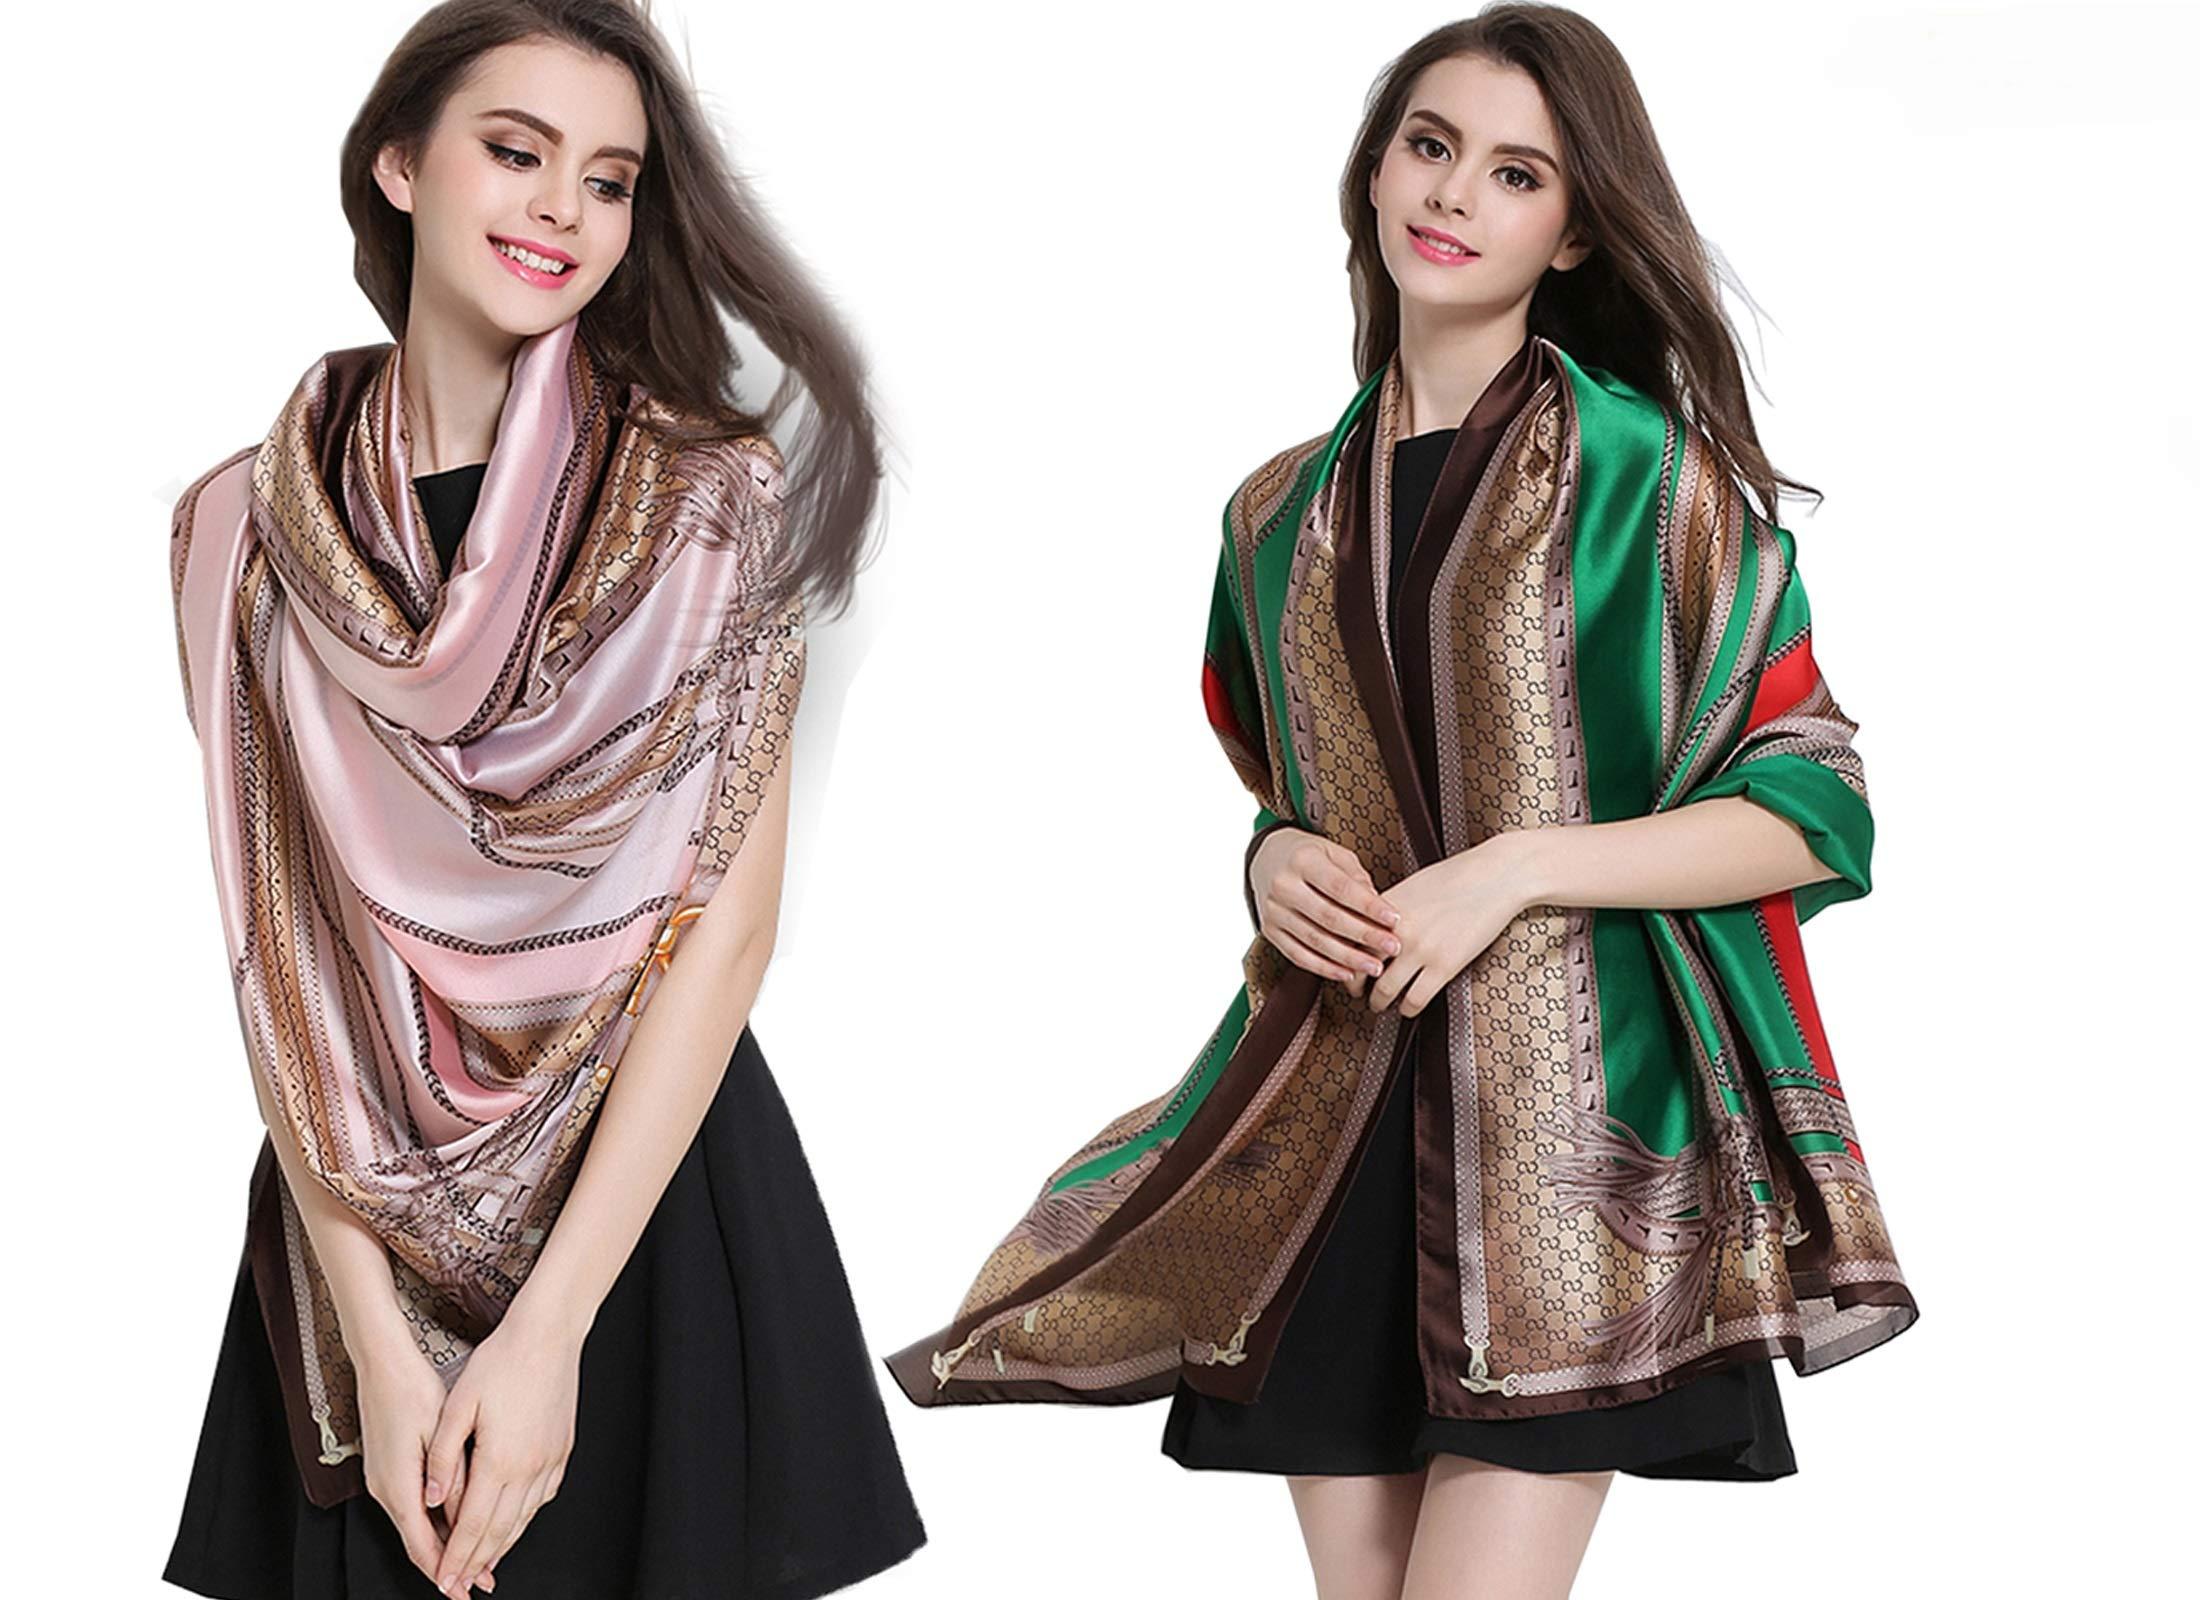 K-ELewon Silk Feeling Scarf Fashion Scarves Long Lightweight Sunscreen Shawls for Women (2 Pcs(Green+Pink))